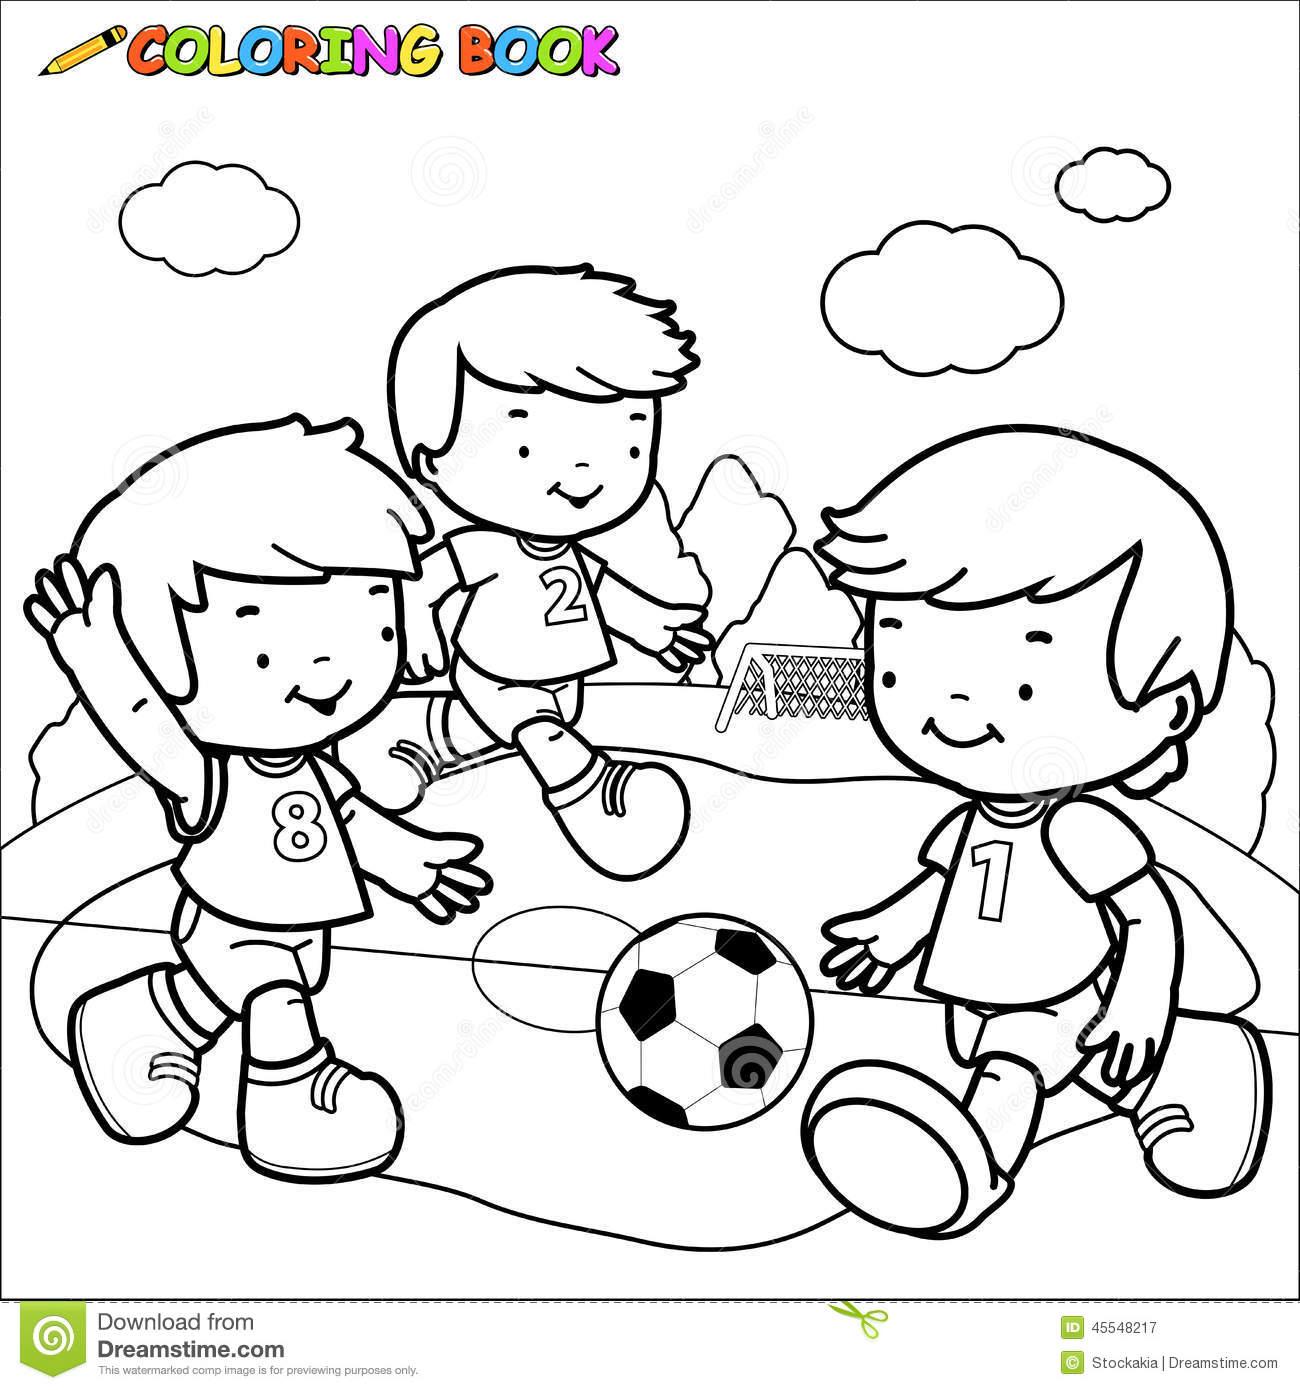 Triple z dessin animé